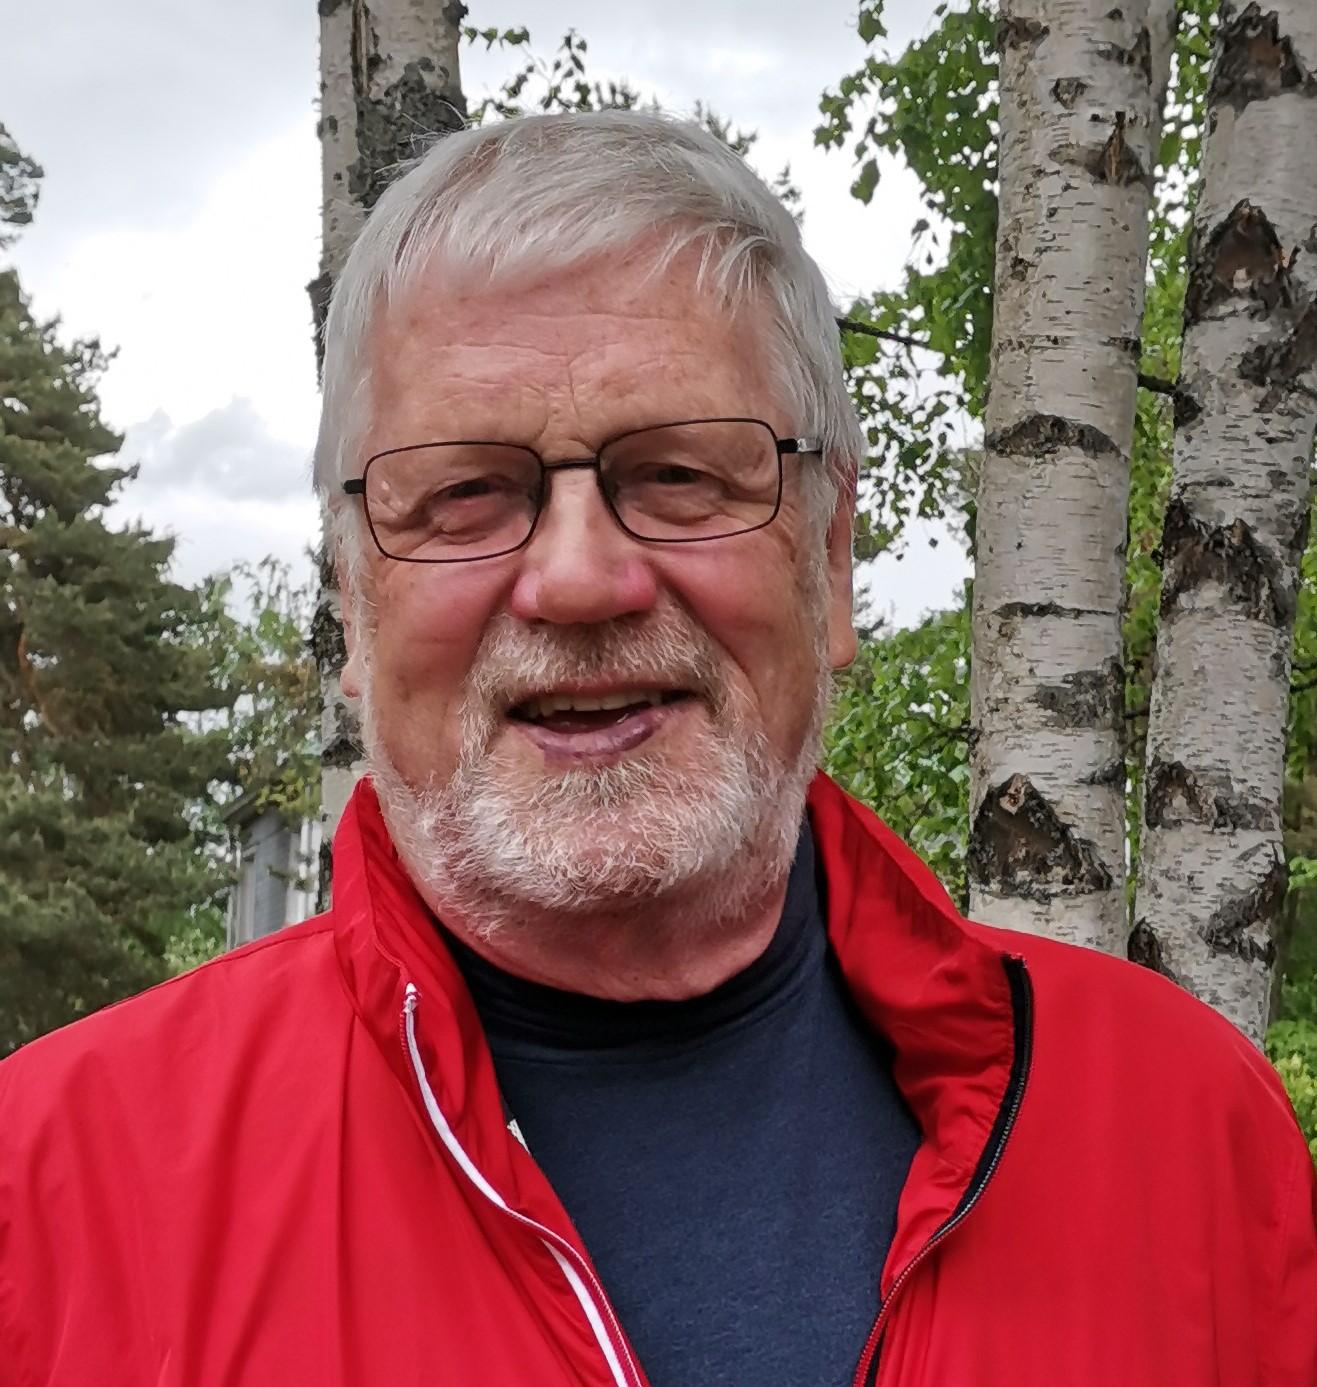 Tapio Vierula